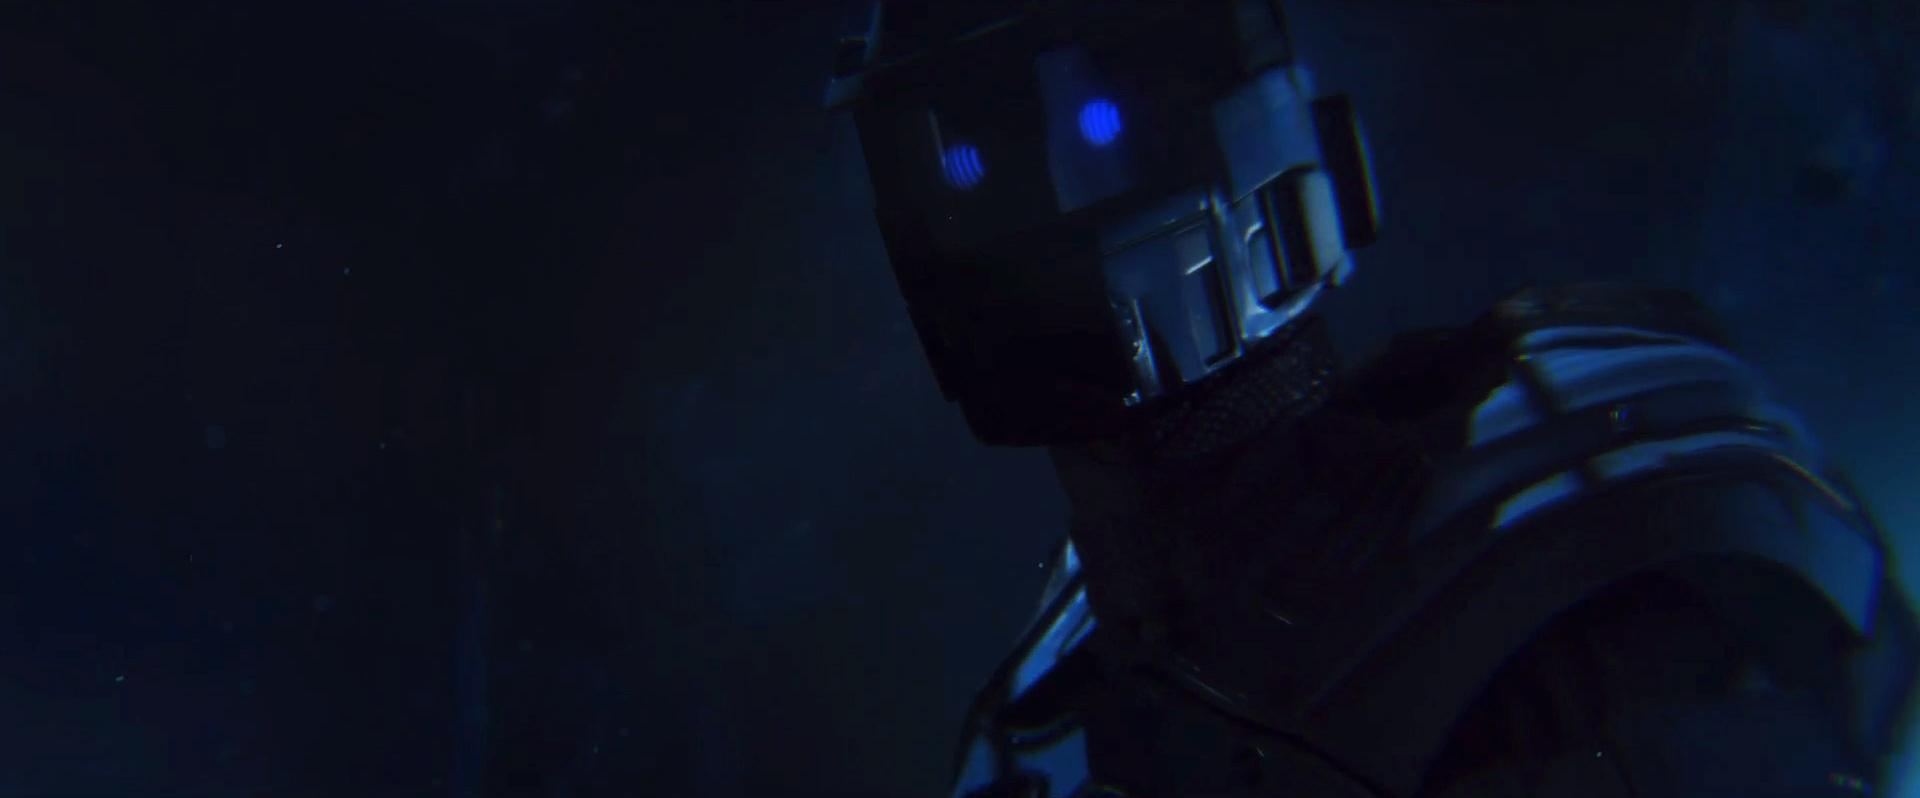 amazingly-cool-sci-fi-short-film-azarkant-5.jpg